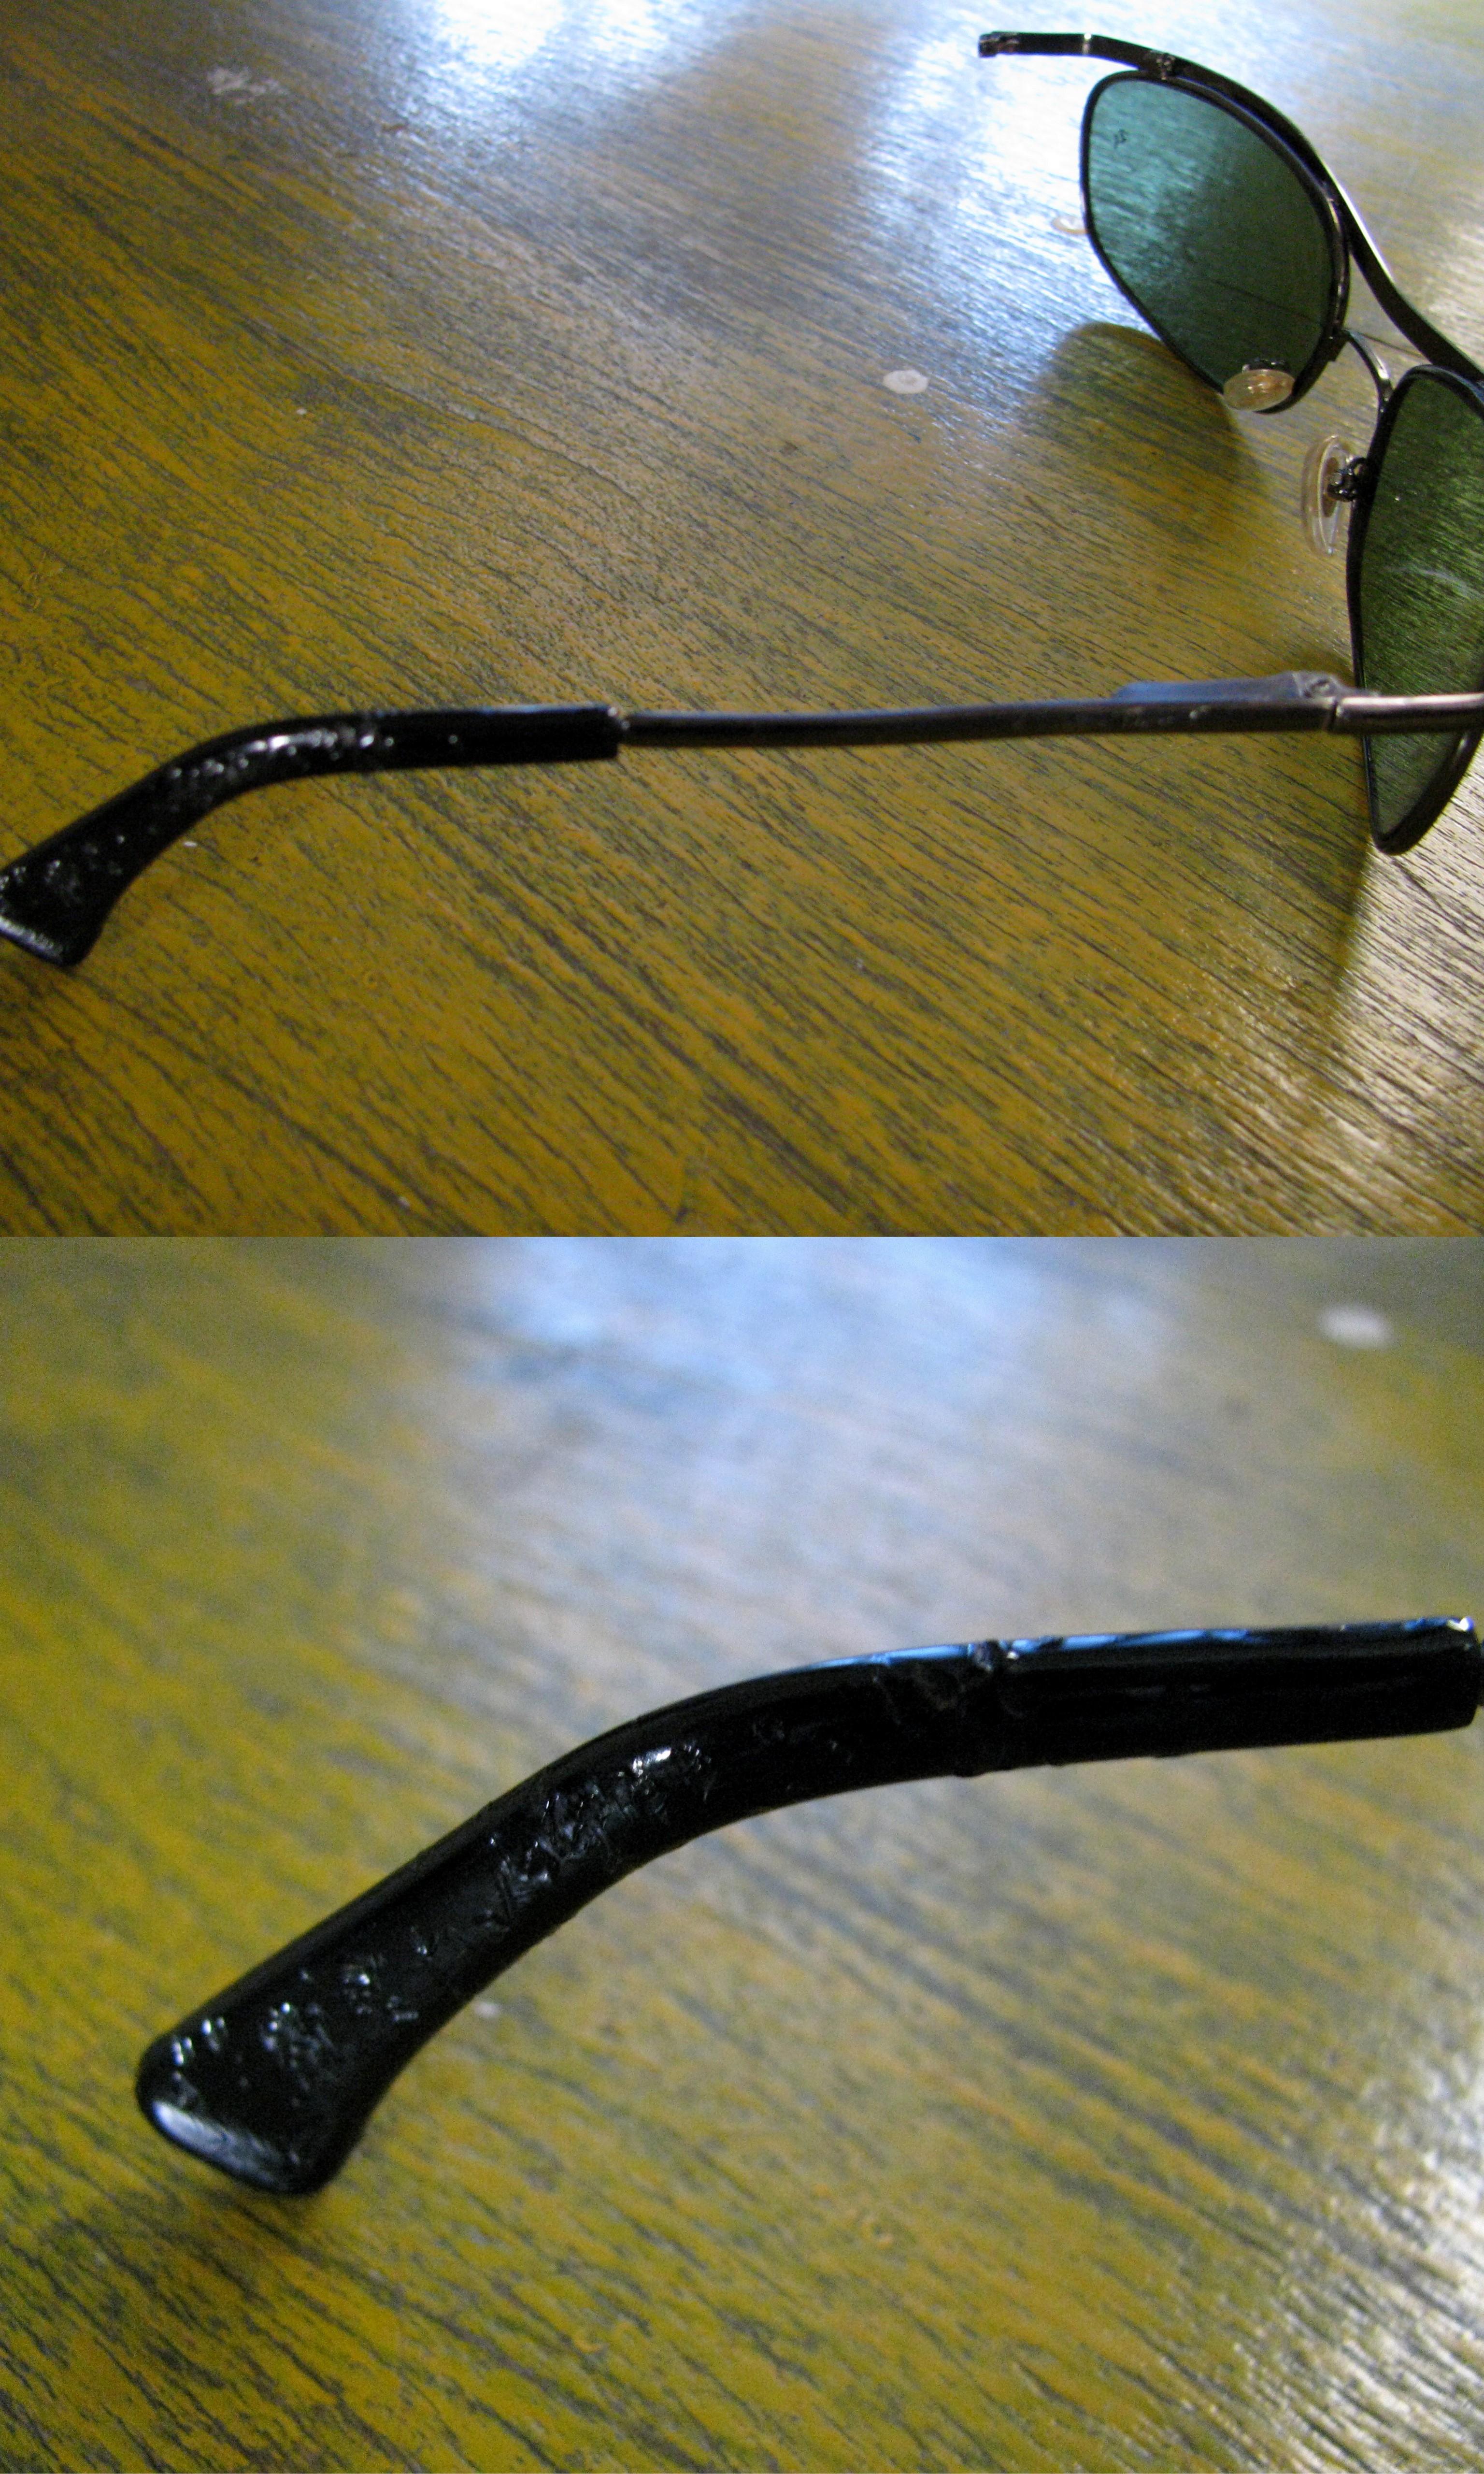 Mia's glasses + monkey's teeth = broken glasses